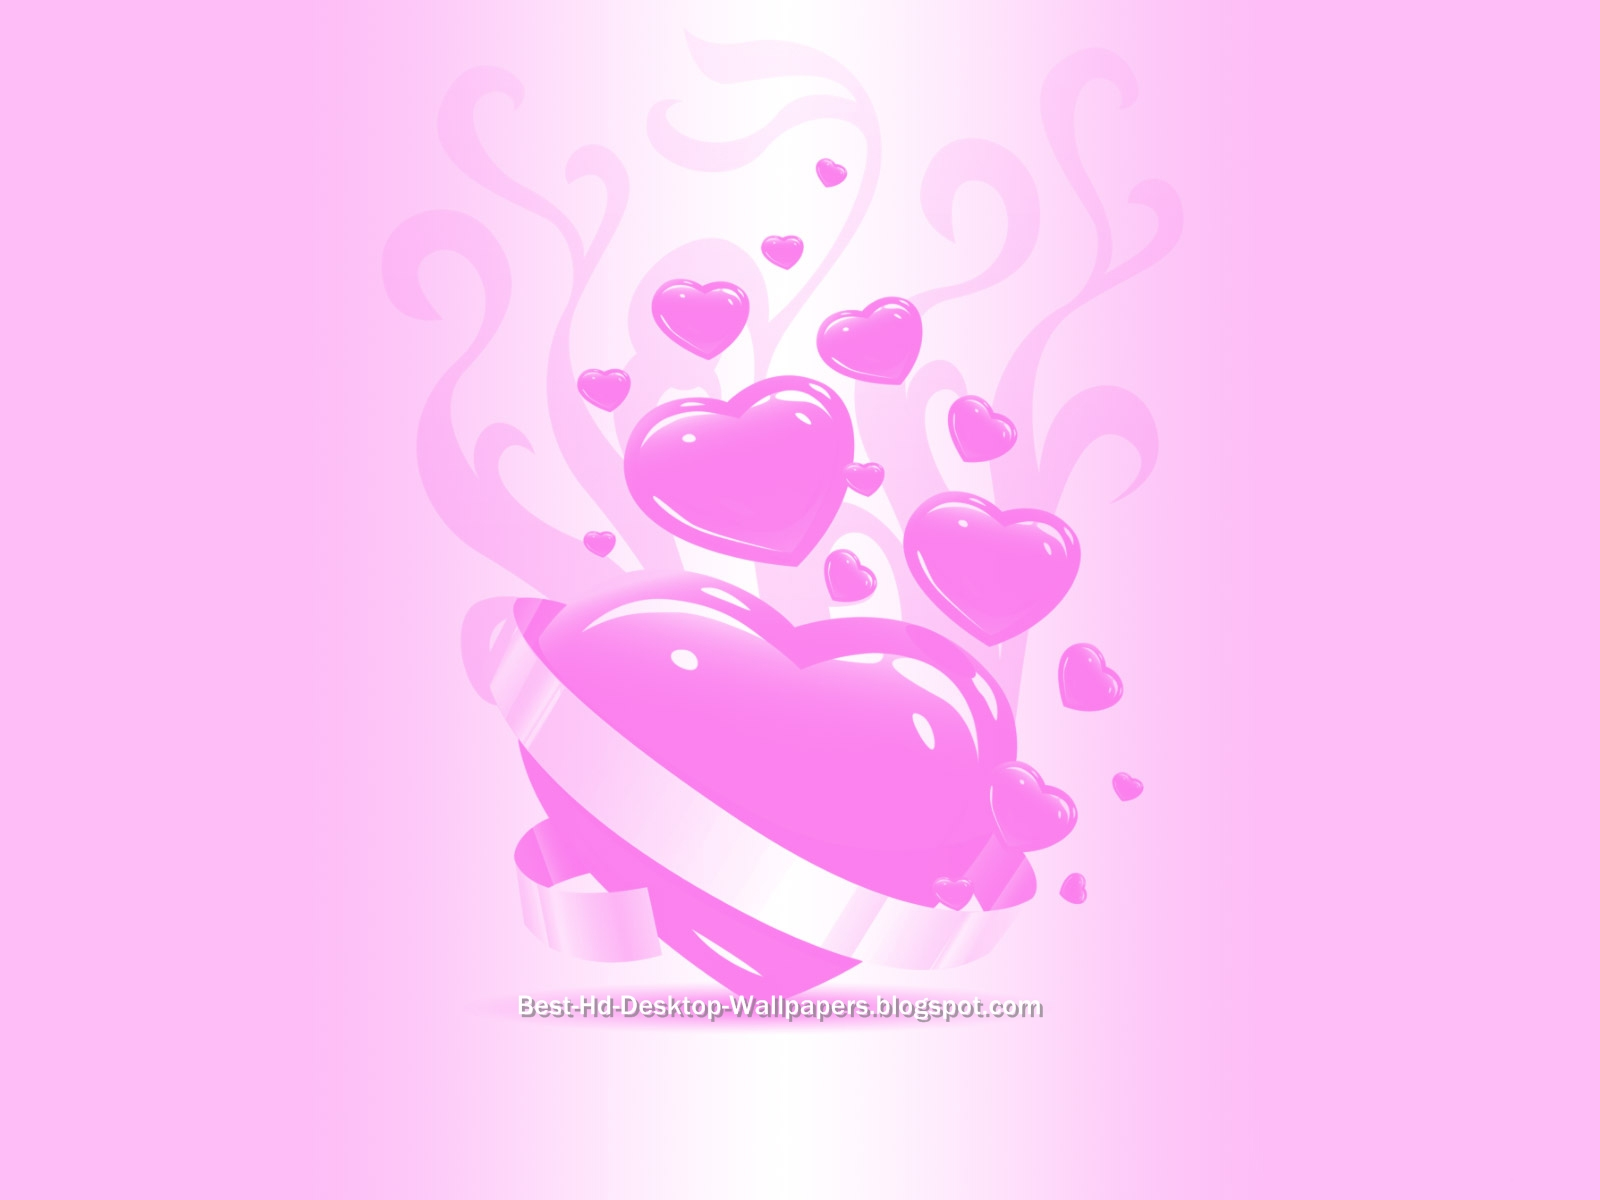 Pink Desktop Wallpapers HD Quality Best HD Desktop 1600x1200